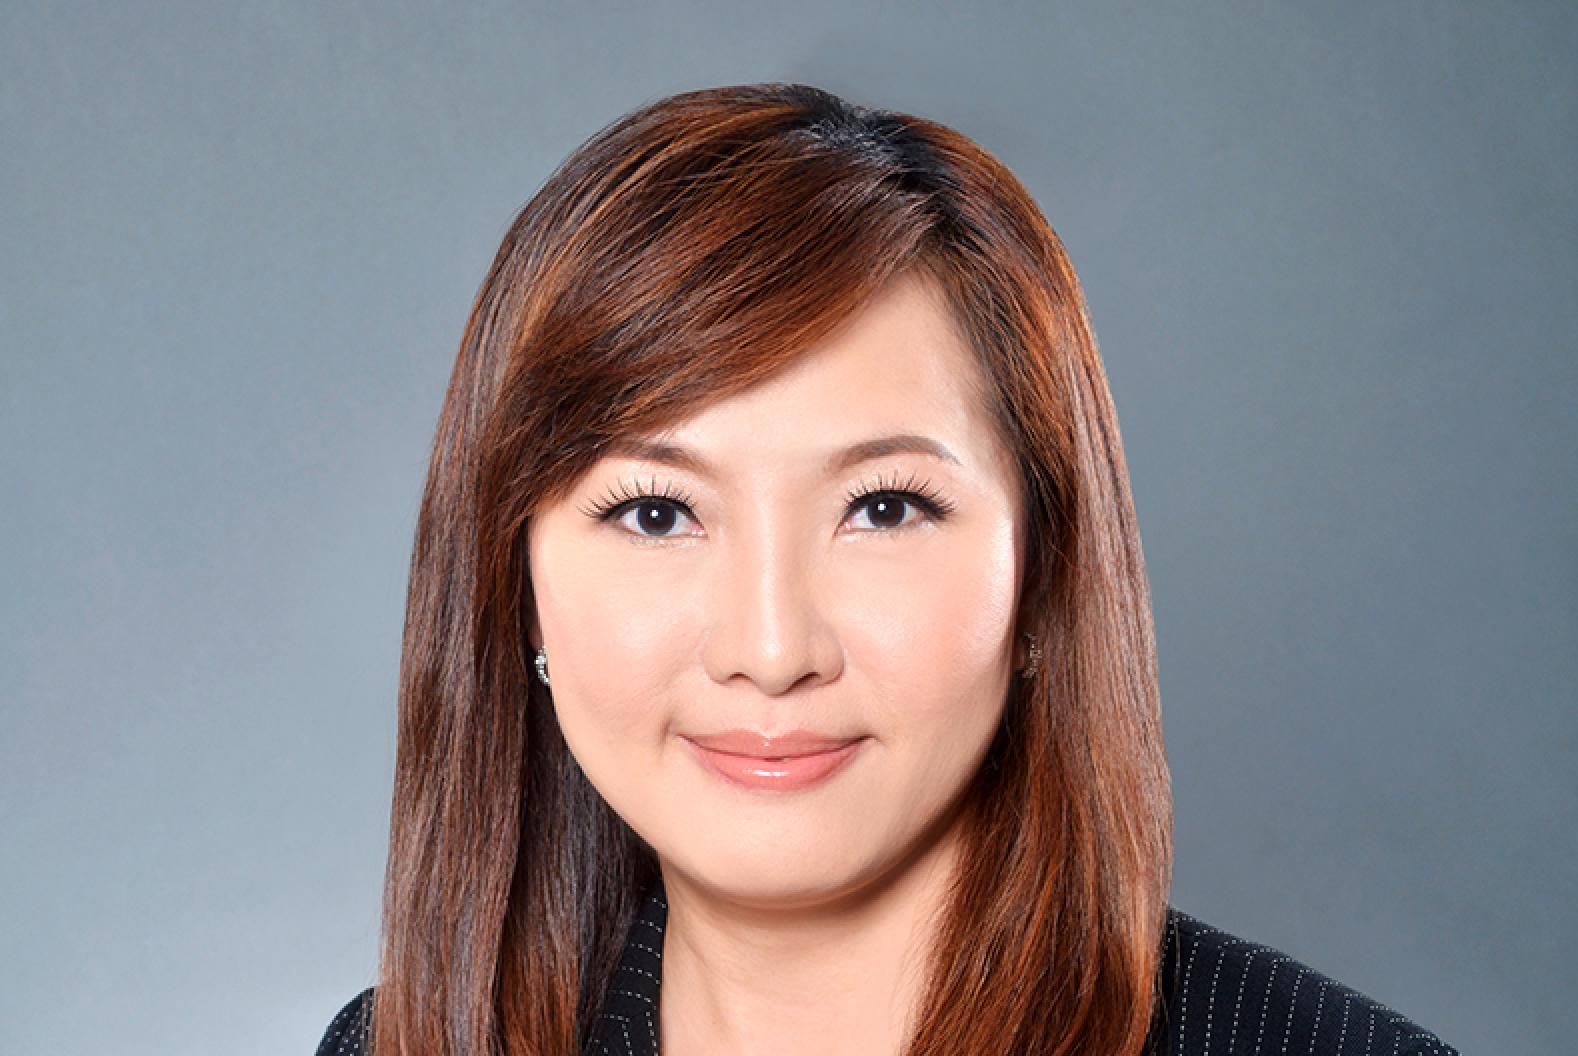 The CEO of Sasseur REIT's manager, Cecilia Tan. (Sasseur REIT)